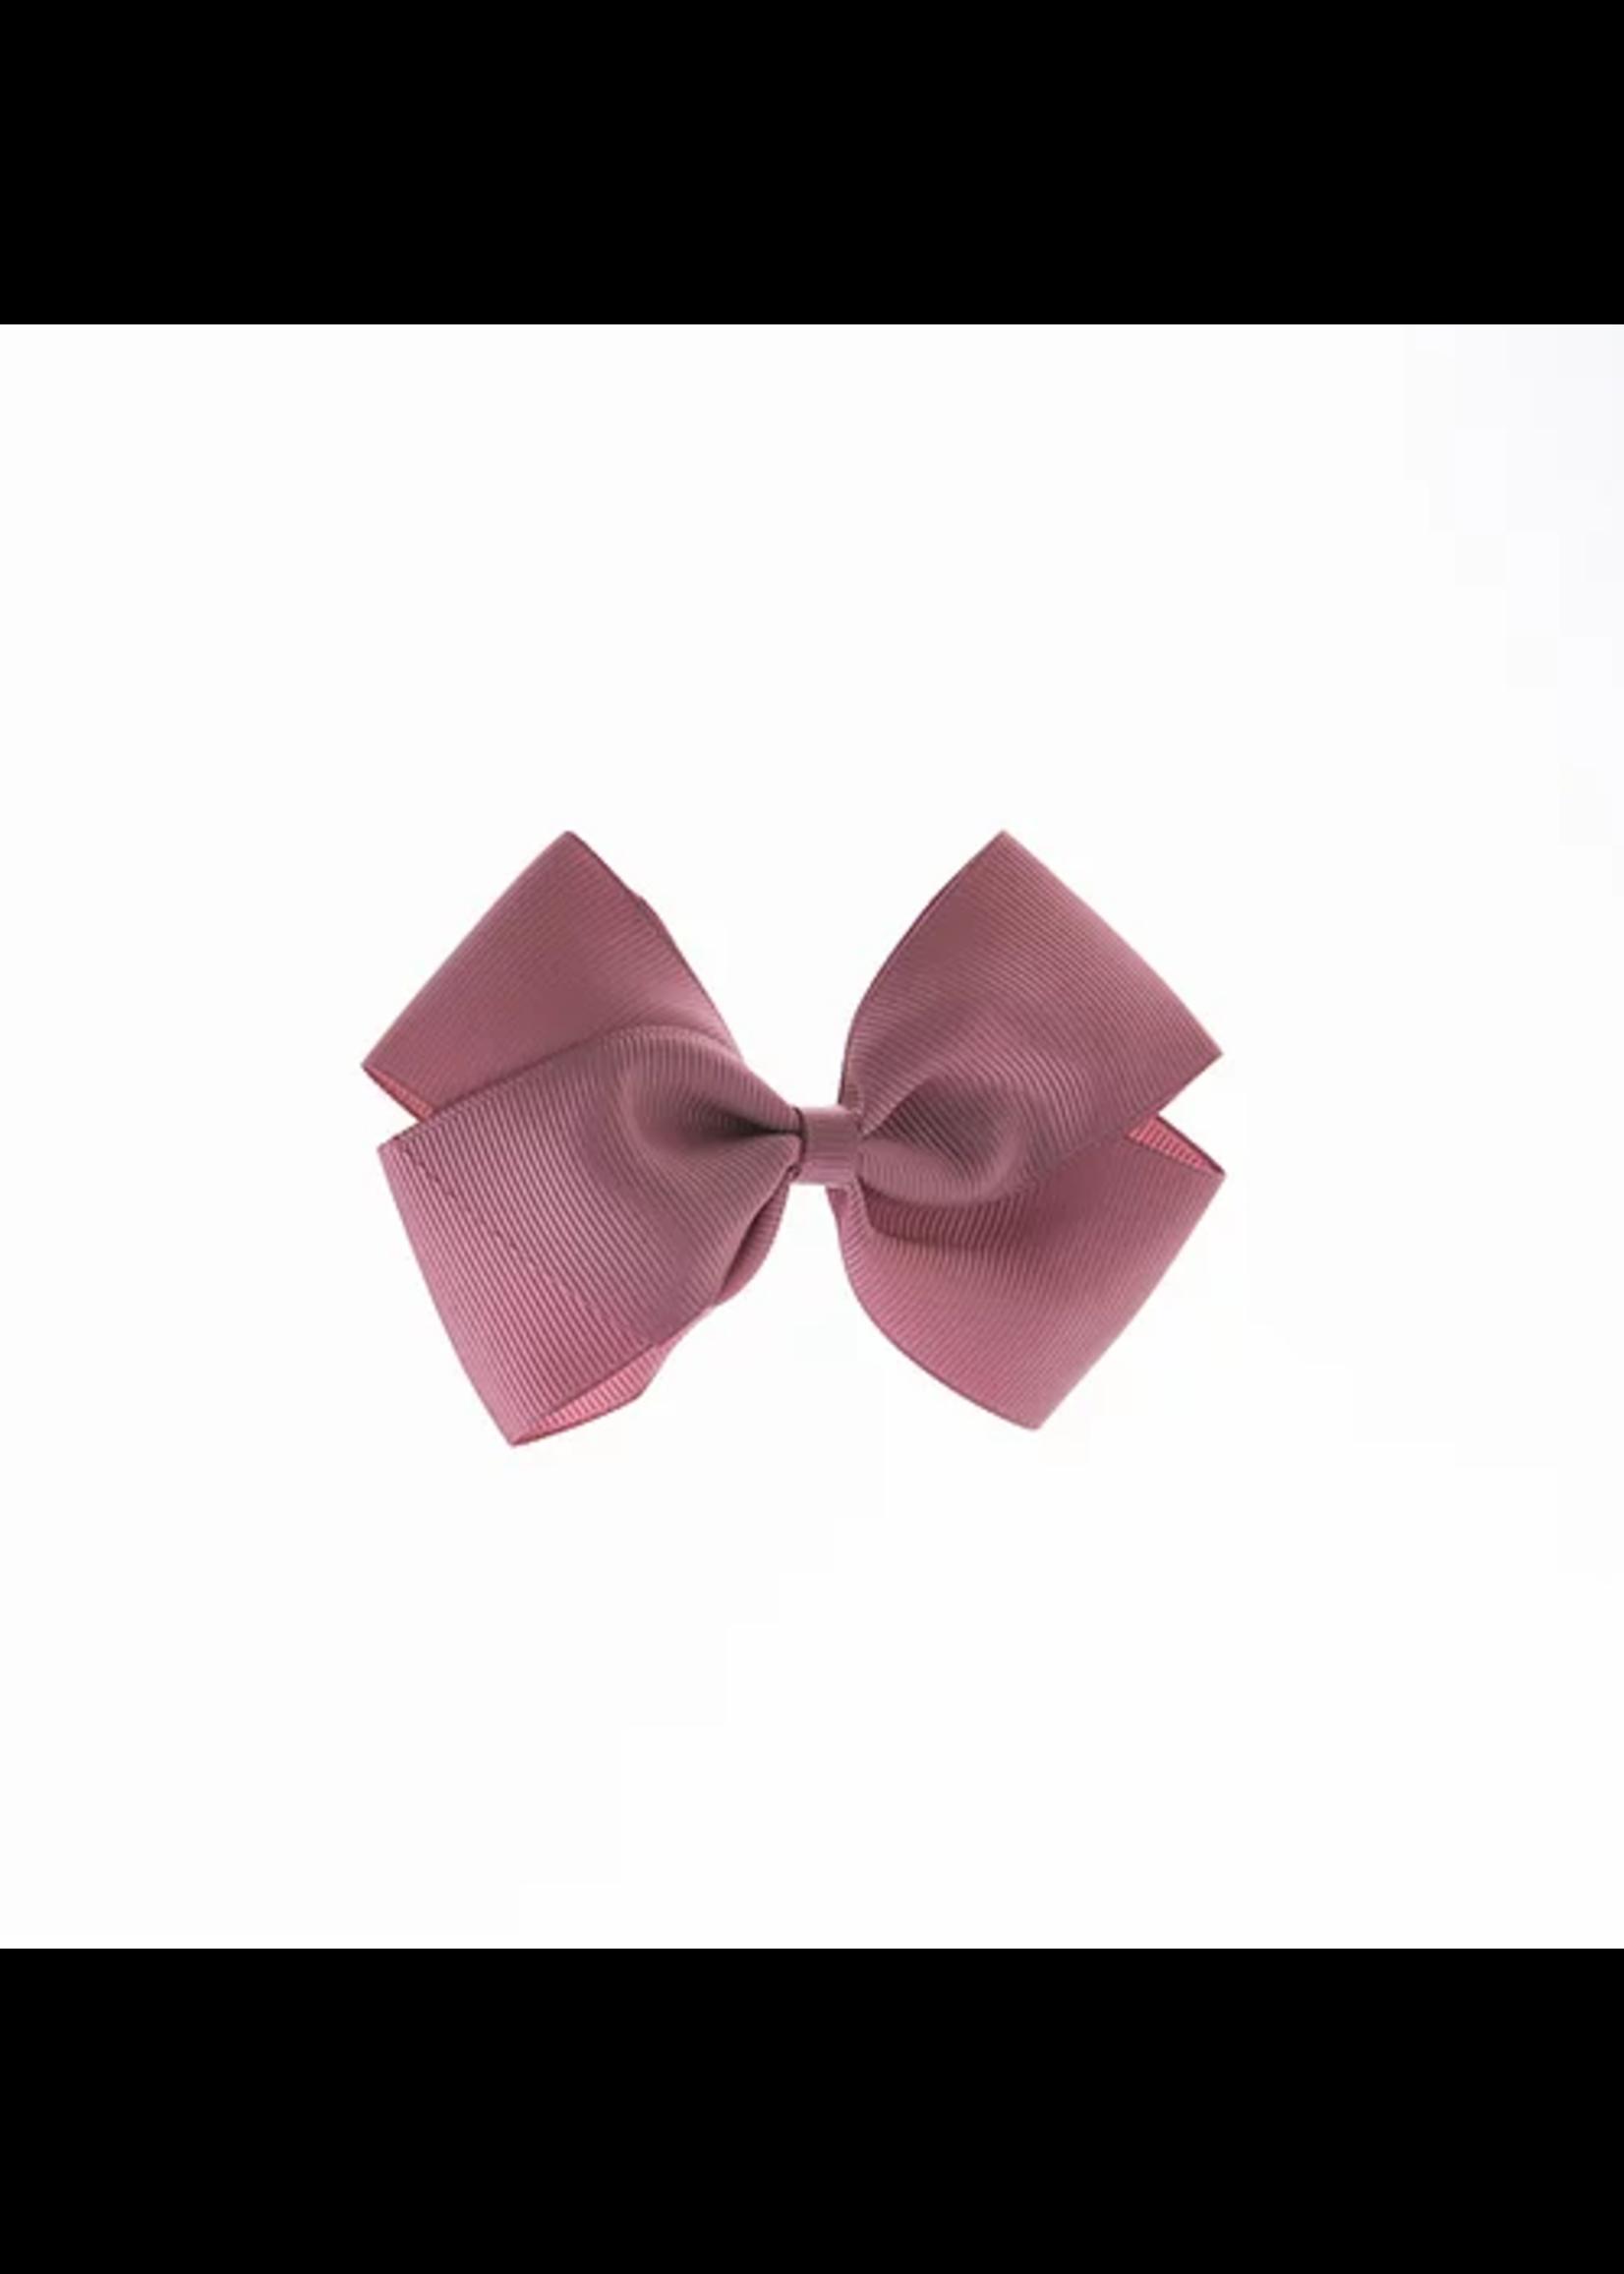 Olilia Medium London Bow (Rosy Mauve)